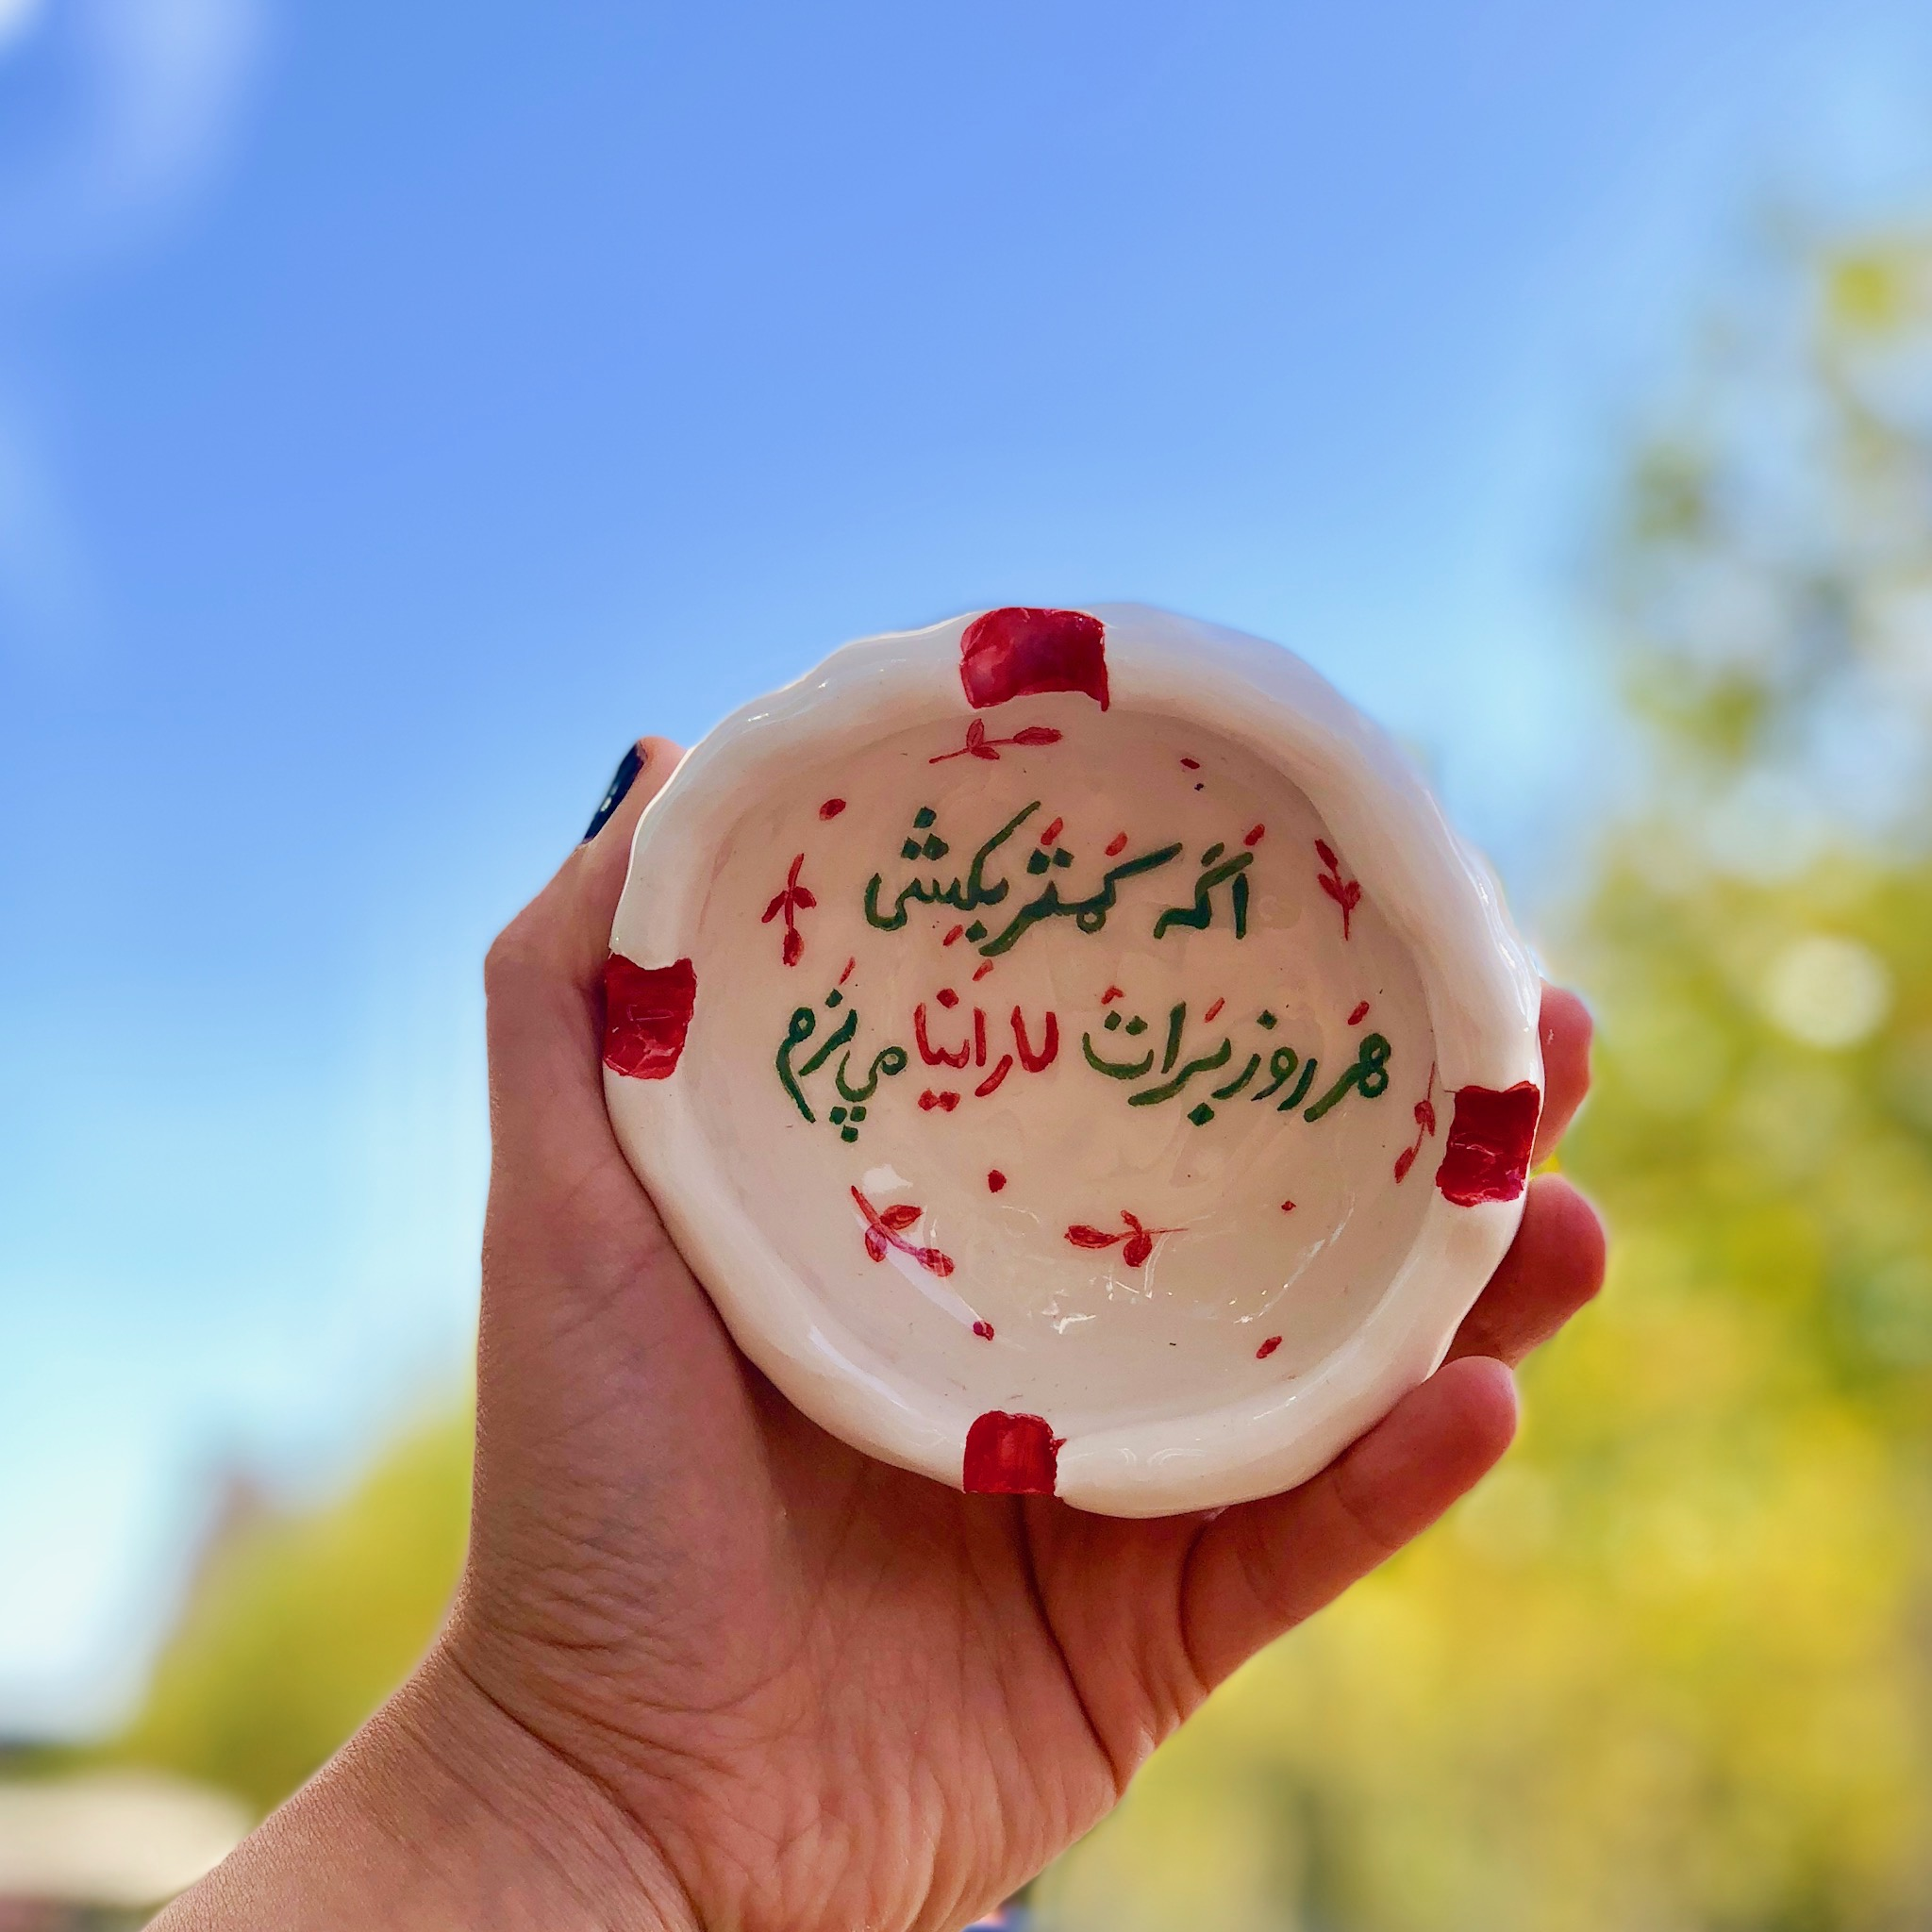 Handmade ceramic ashtray by NamArtcraft اگه کمتر بکشی هر روز برات لازانیا می پزم